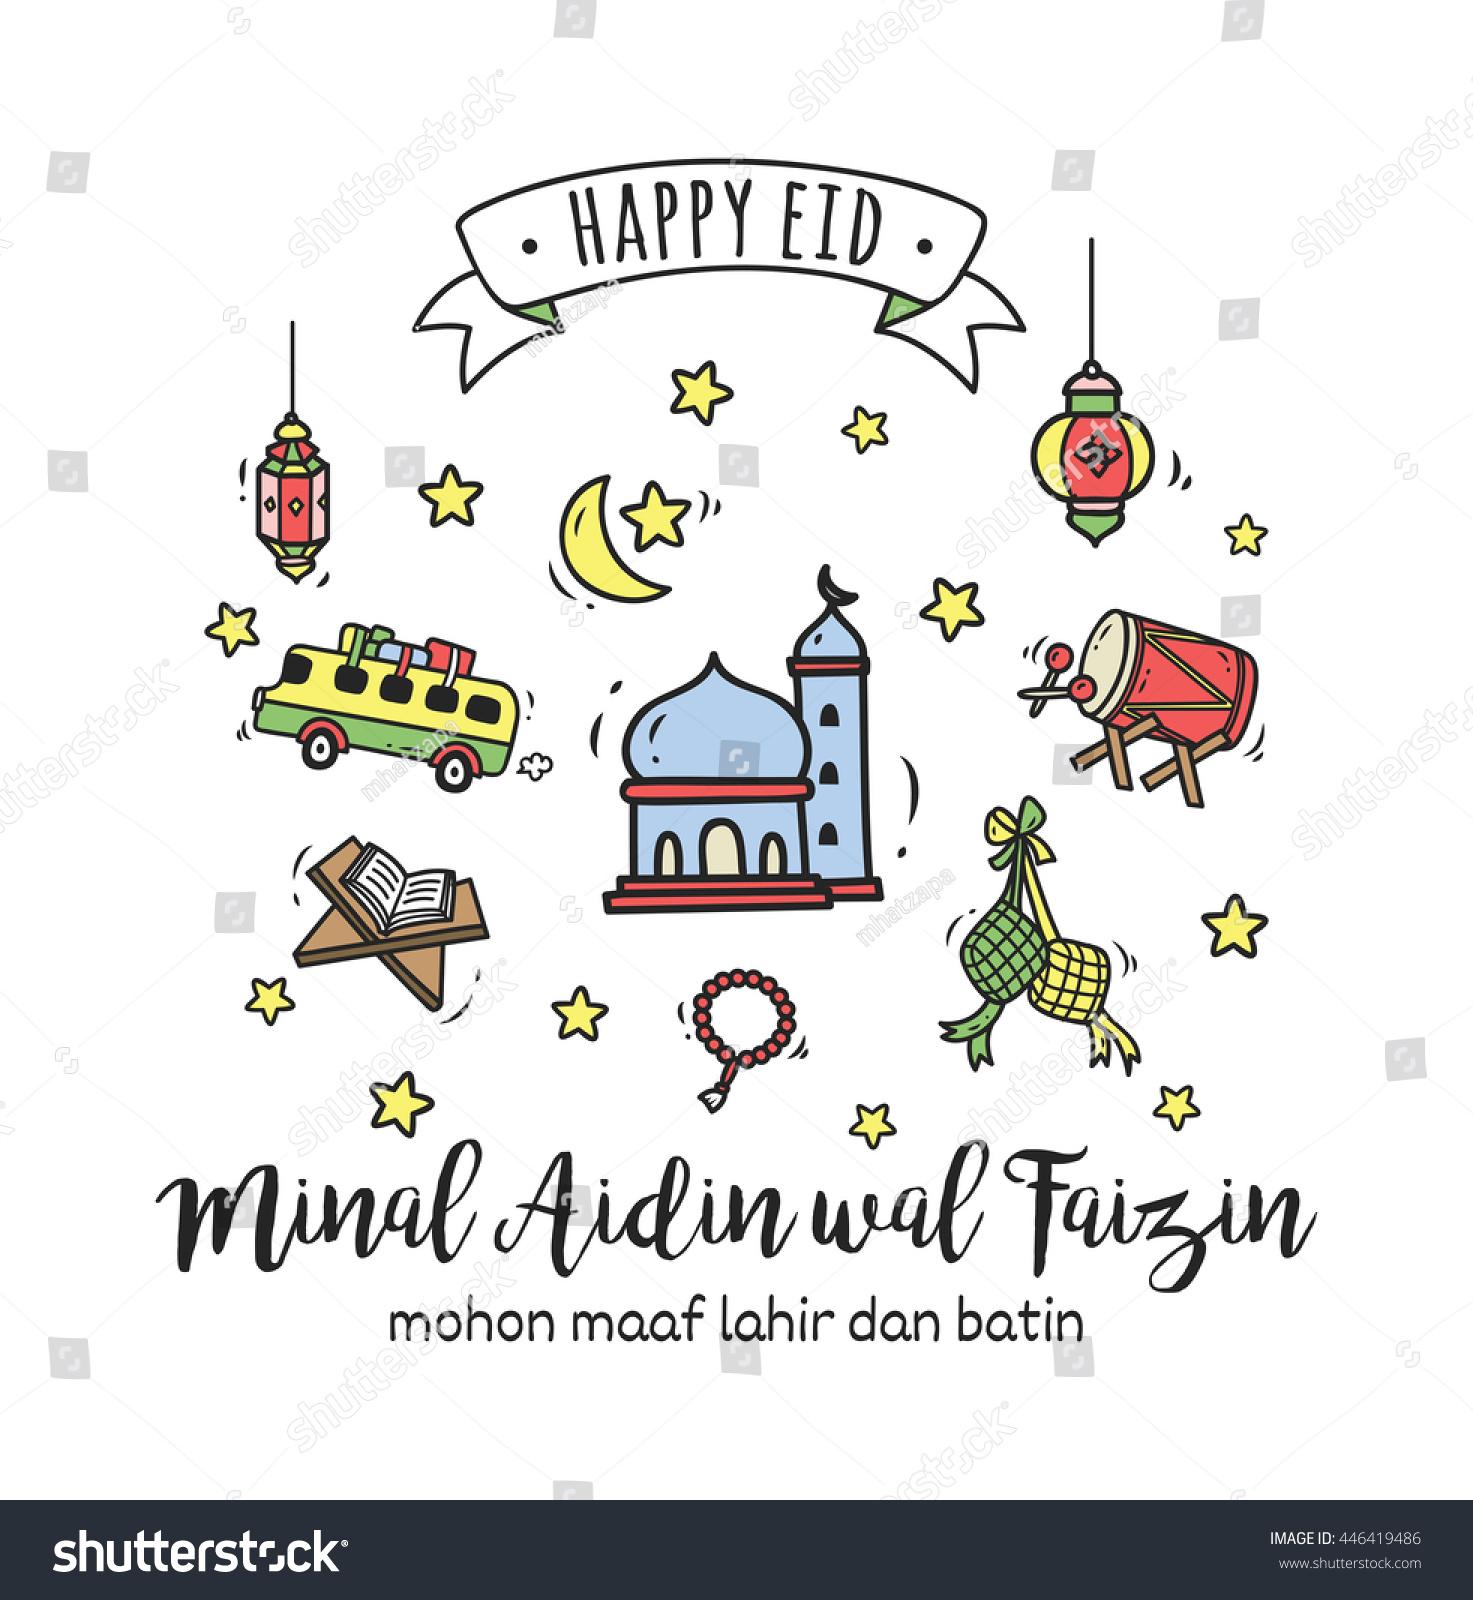 Indonesian idul fitri greeting card doodle stock vector 446419486 indonesian idul fitri greeting card in doodle stye with minal aidin wal faizin text m4hsunfo